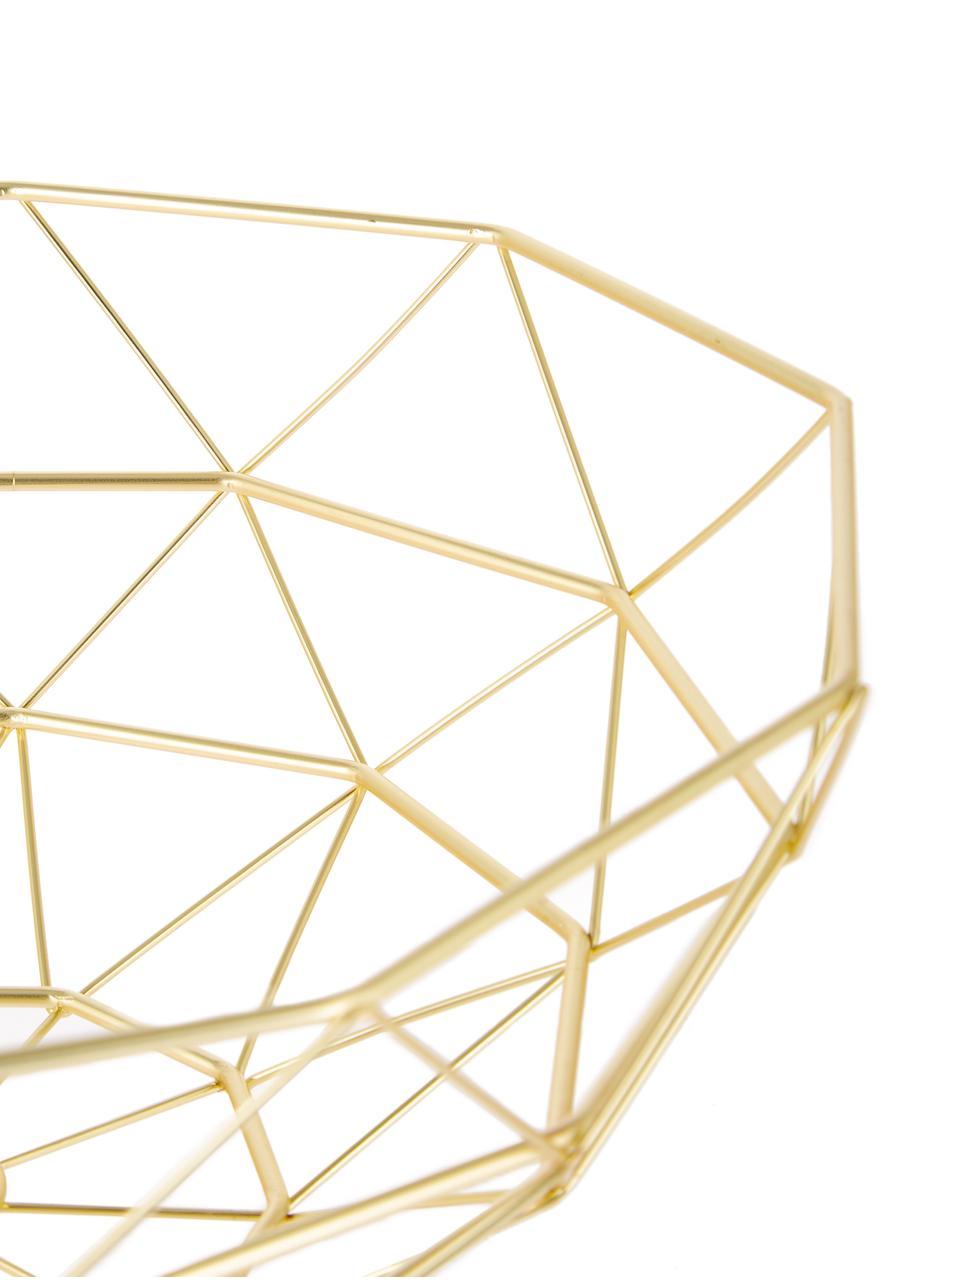 Opbergmand Diamond Cut goudkleur, Metaal, Mat goudkleurig, Ø 35 x H 13 cm